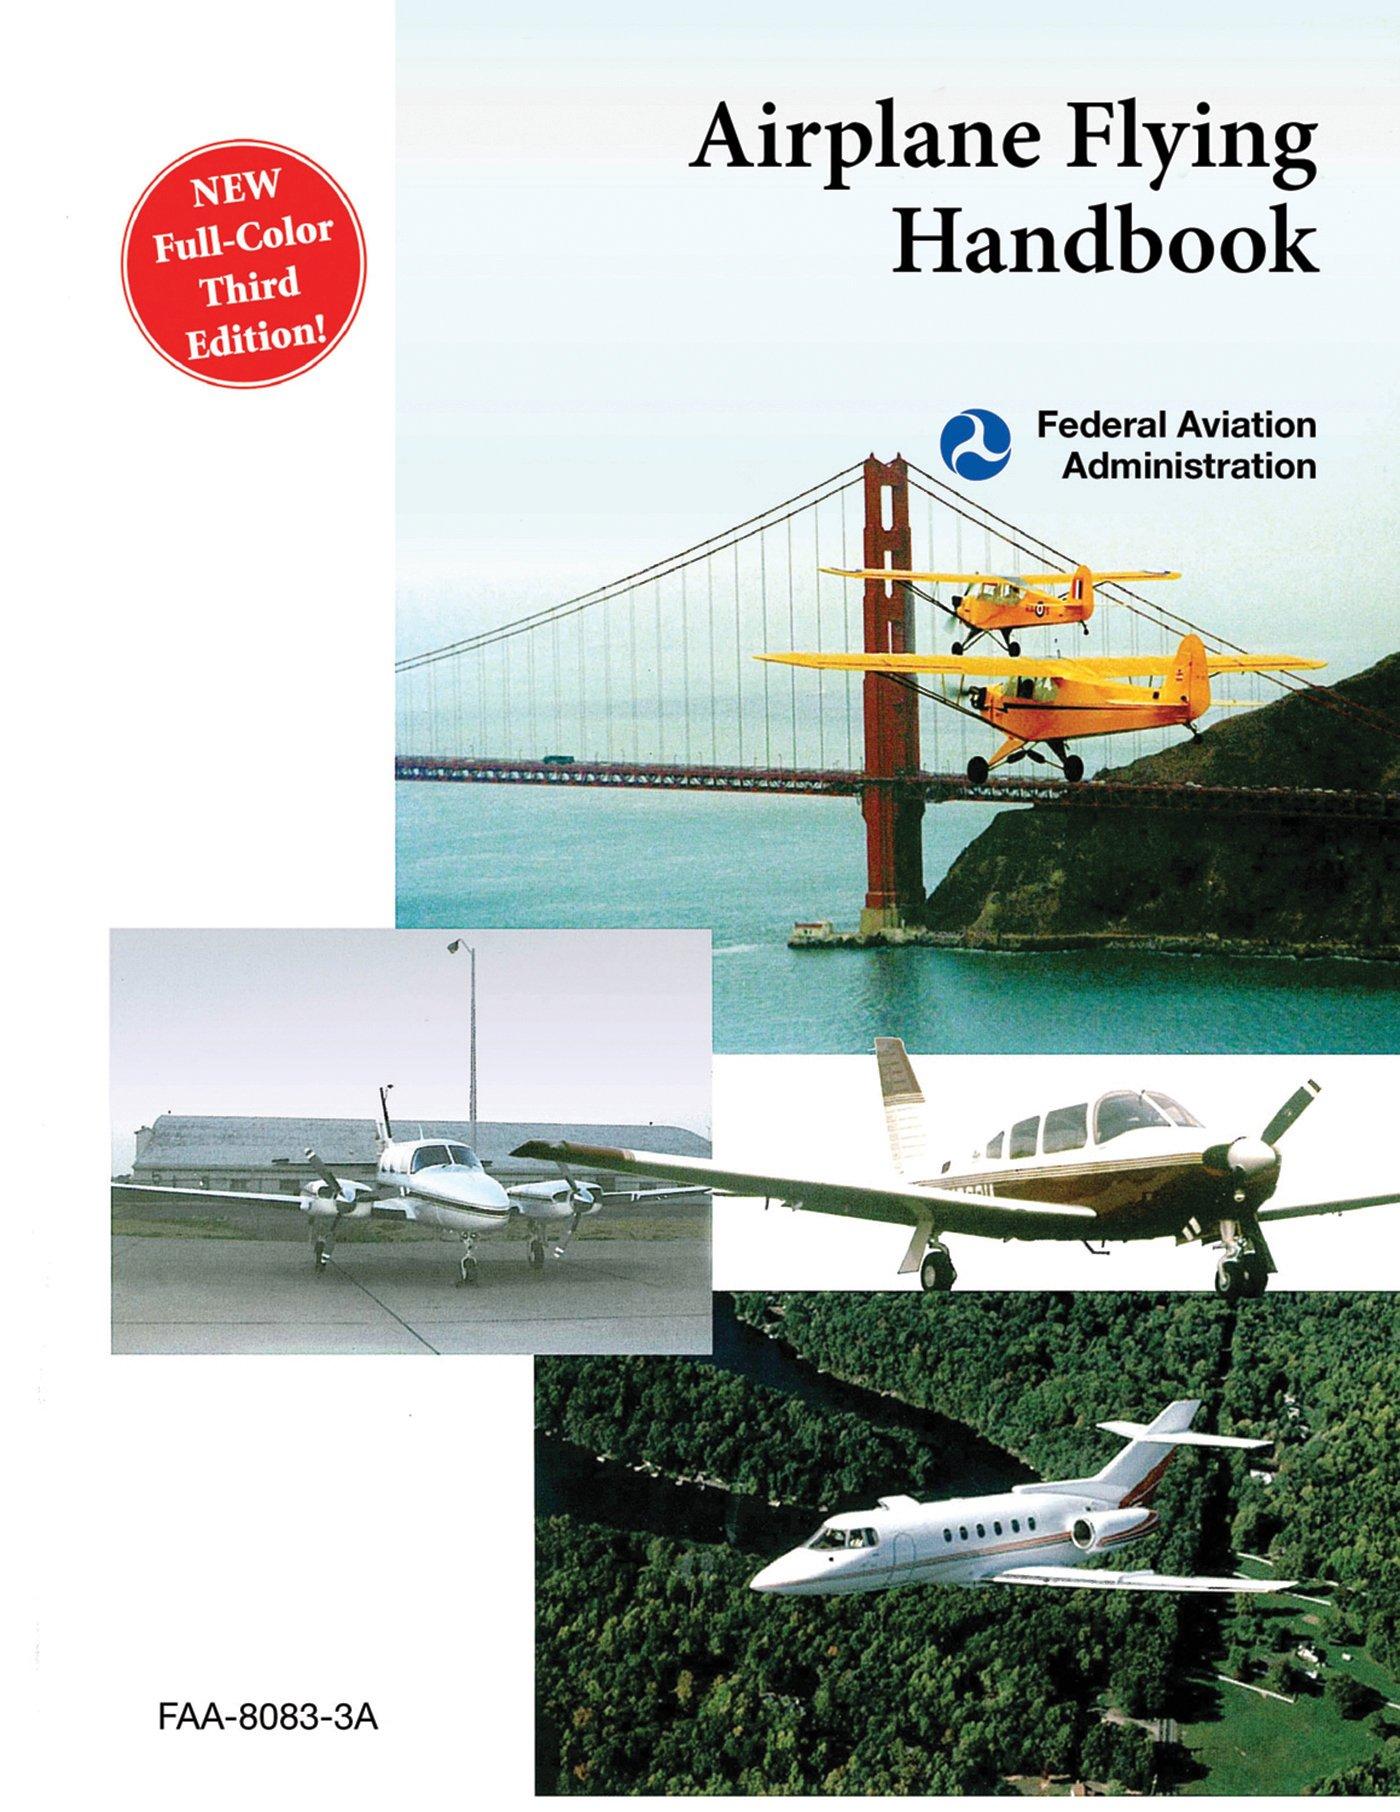 Airplane Flying Handbook (FAA-H-8083-3A)